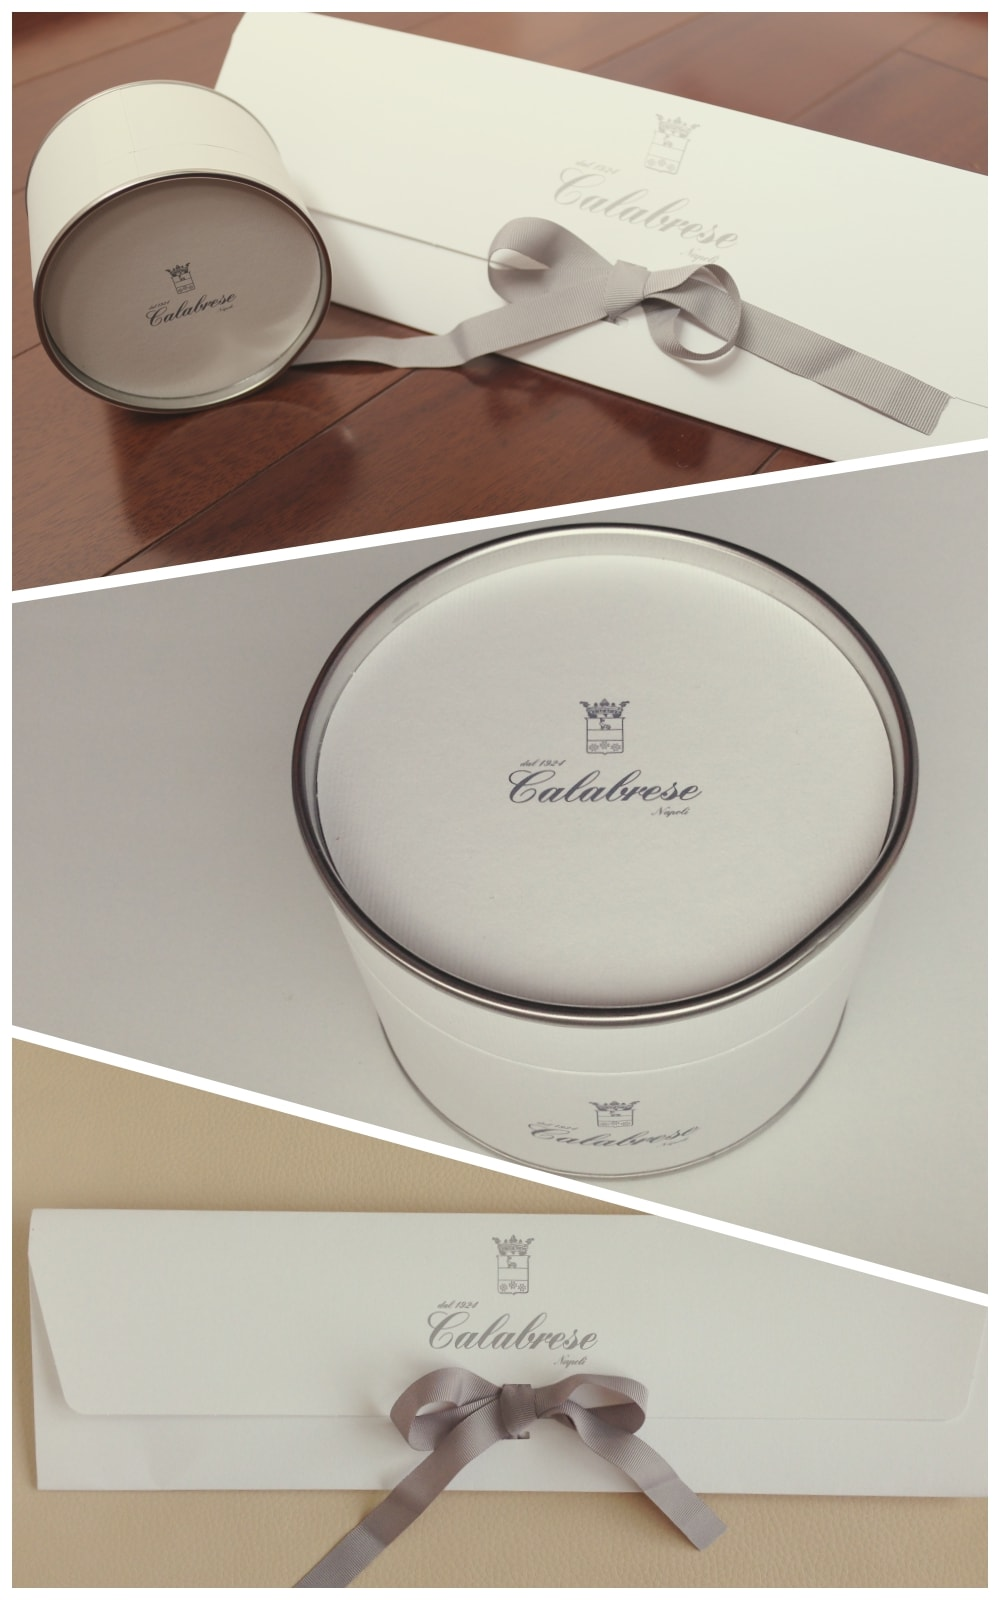 Calabrese - упаковка